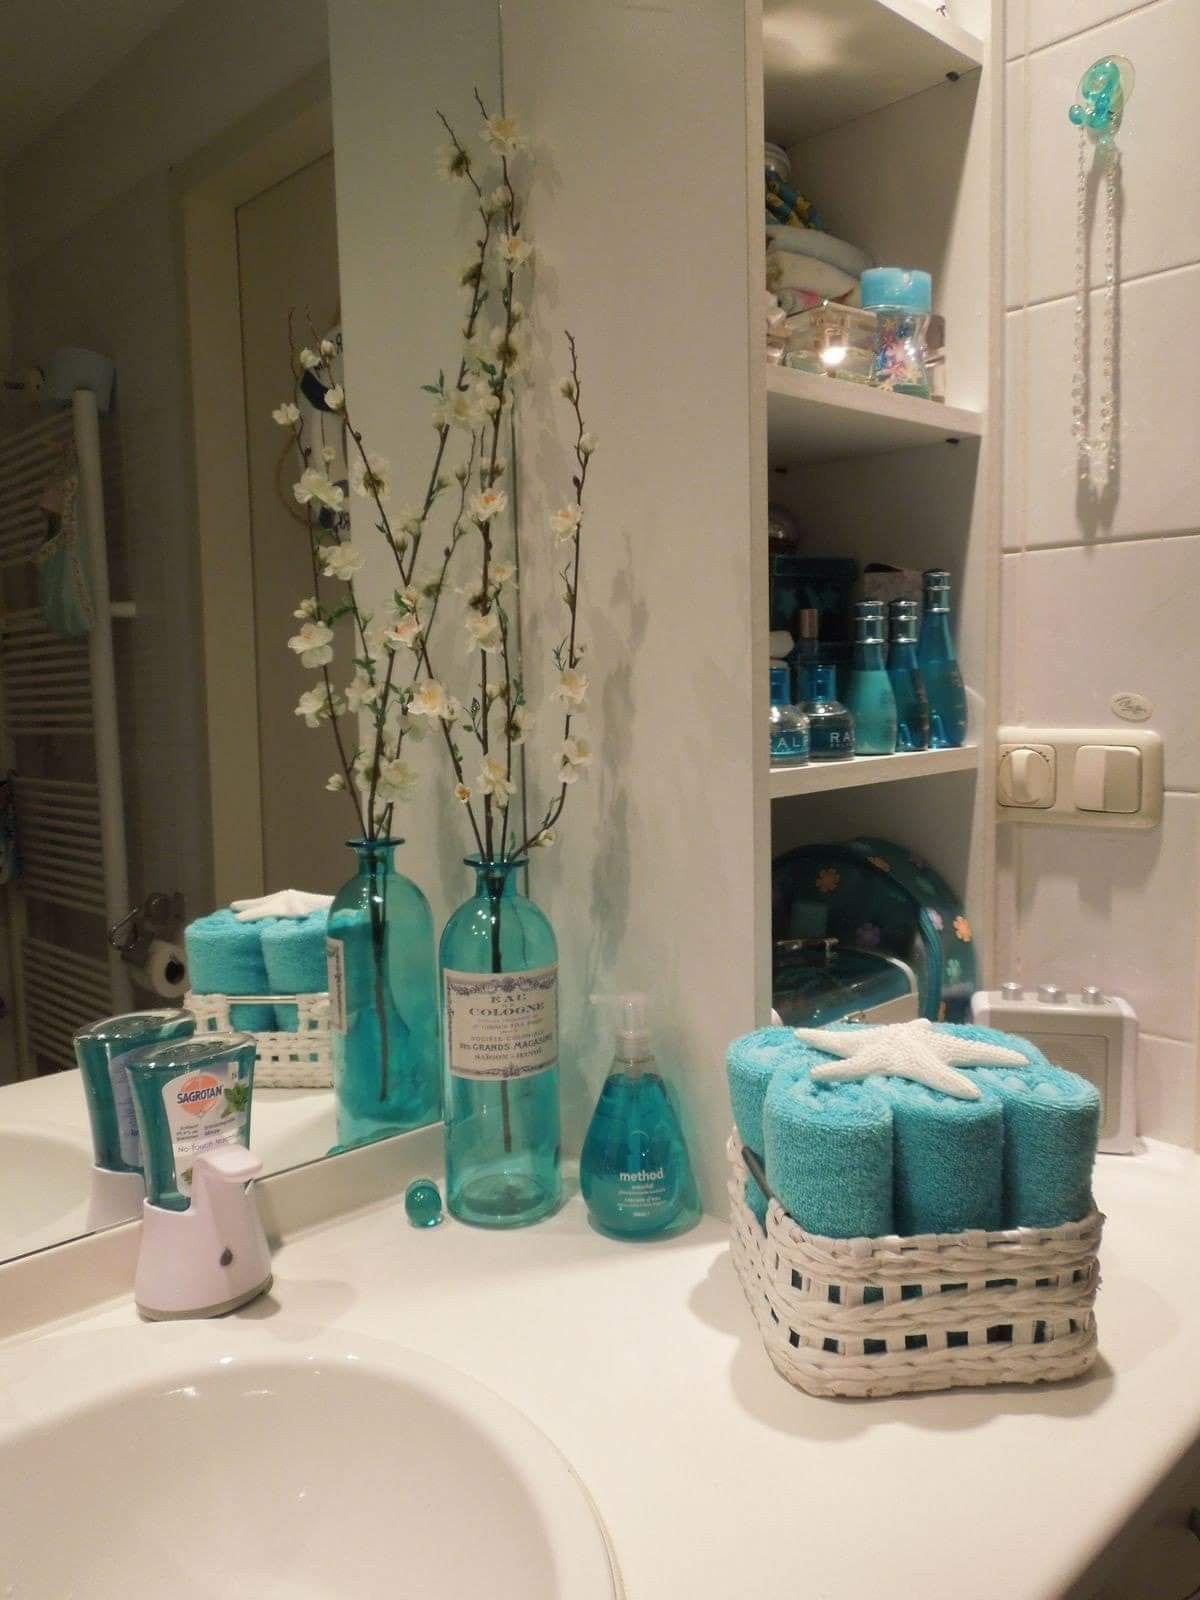 Teal Bathroom Decor 2021 in 2020 | Teal bathroom decor ...